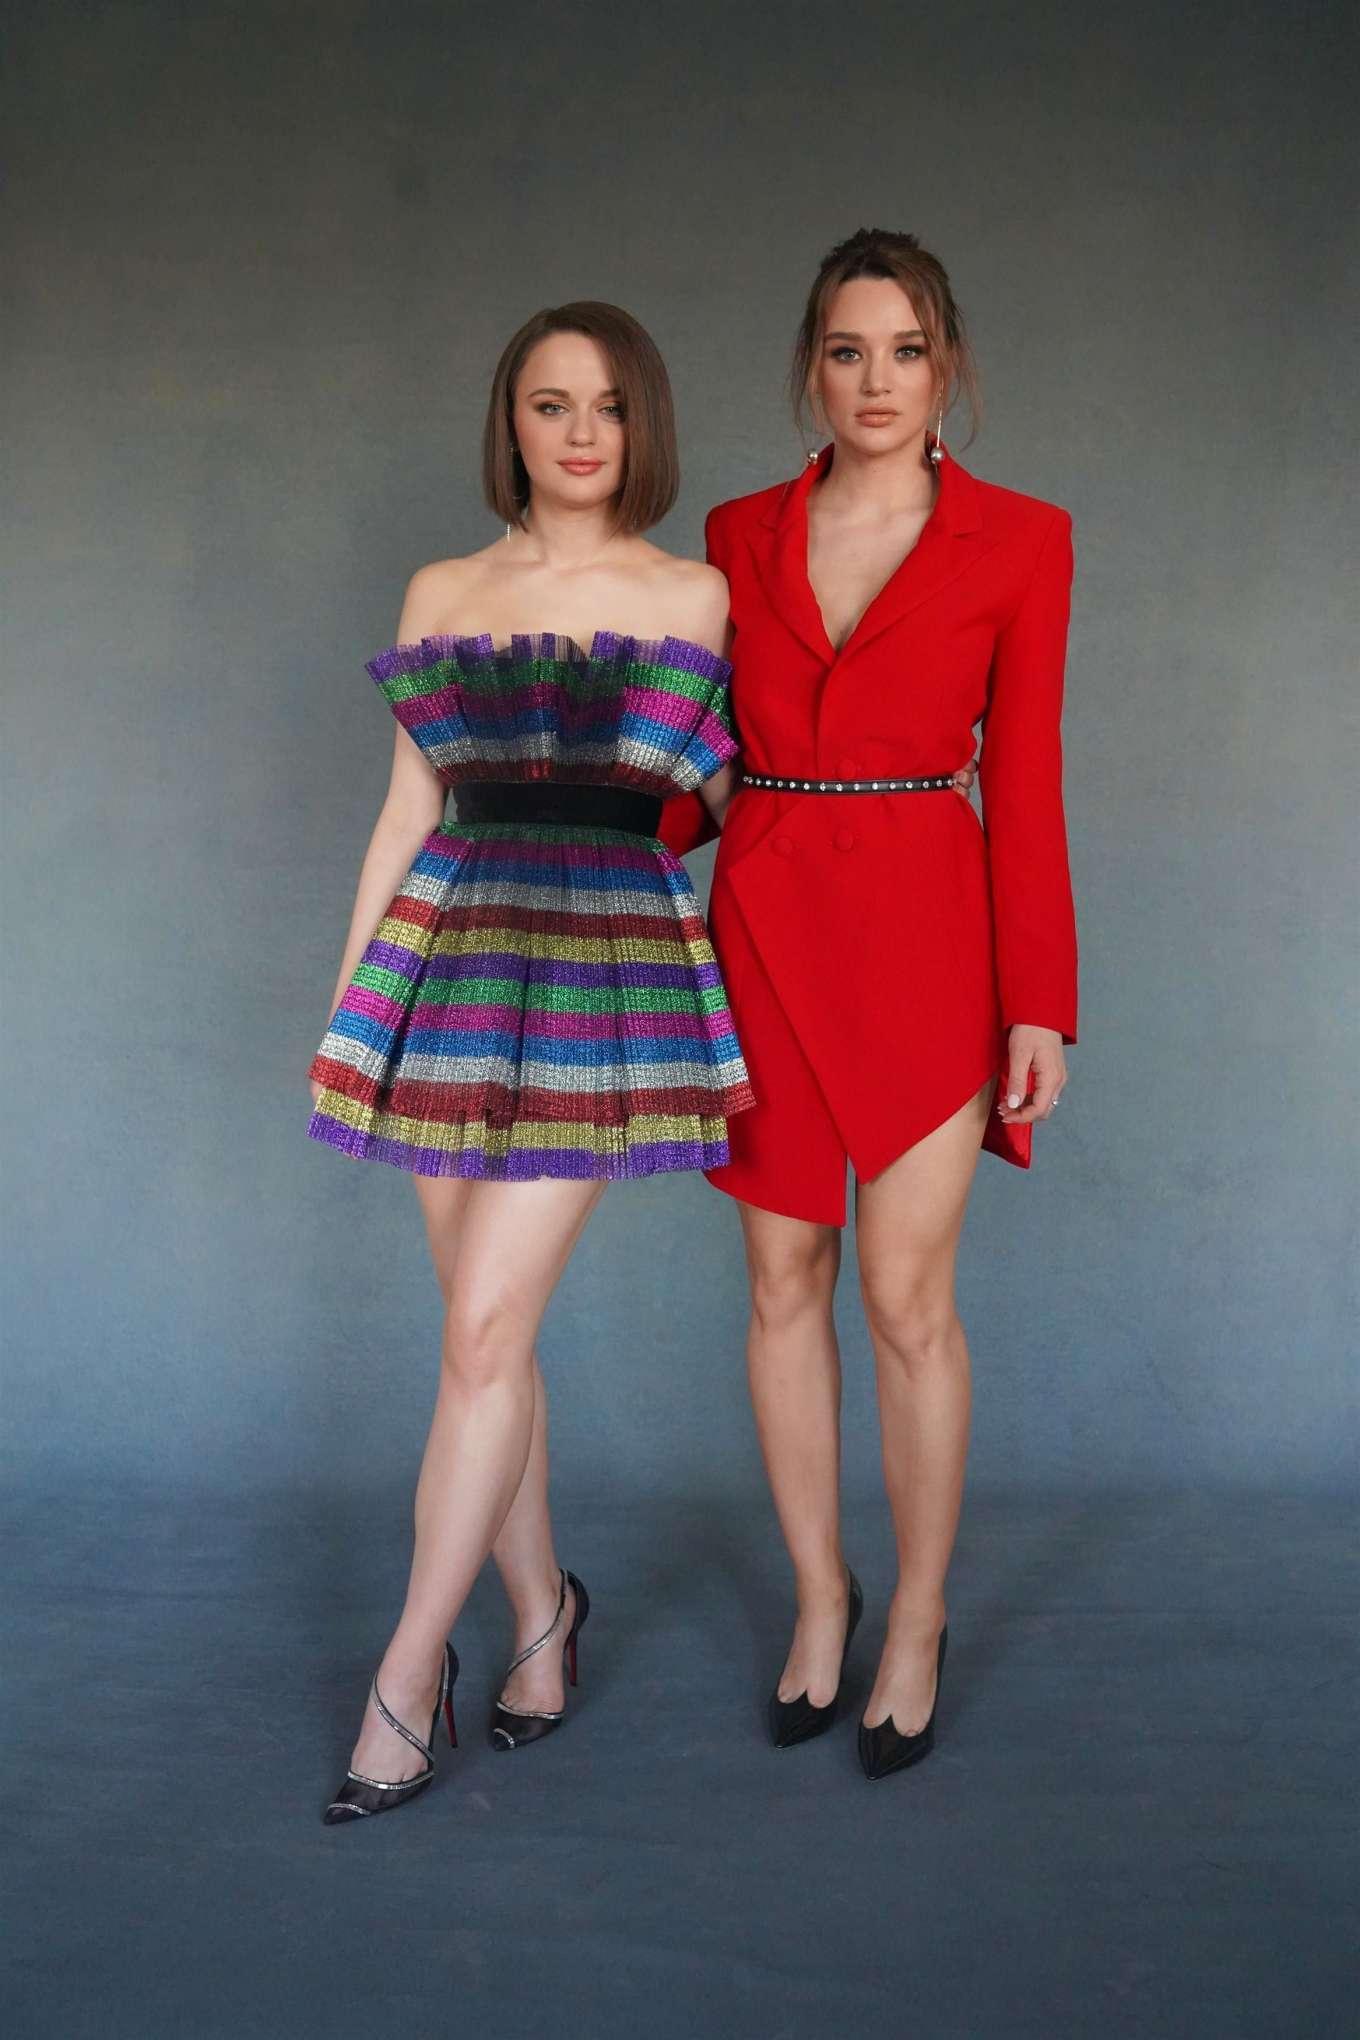 Hunter King 2019 : Hunter King – Wearing a Nathalie Karam red dress for a photoshoot at PCA 2019 in LA-01